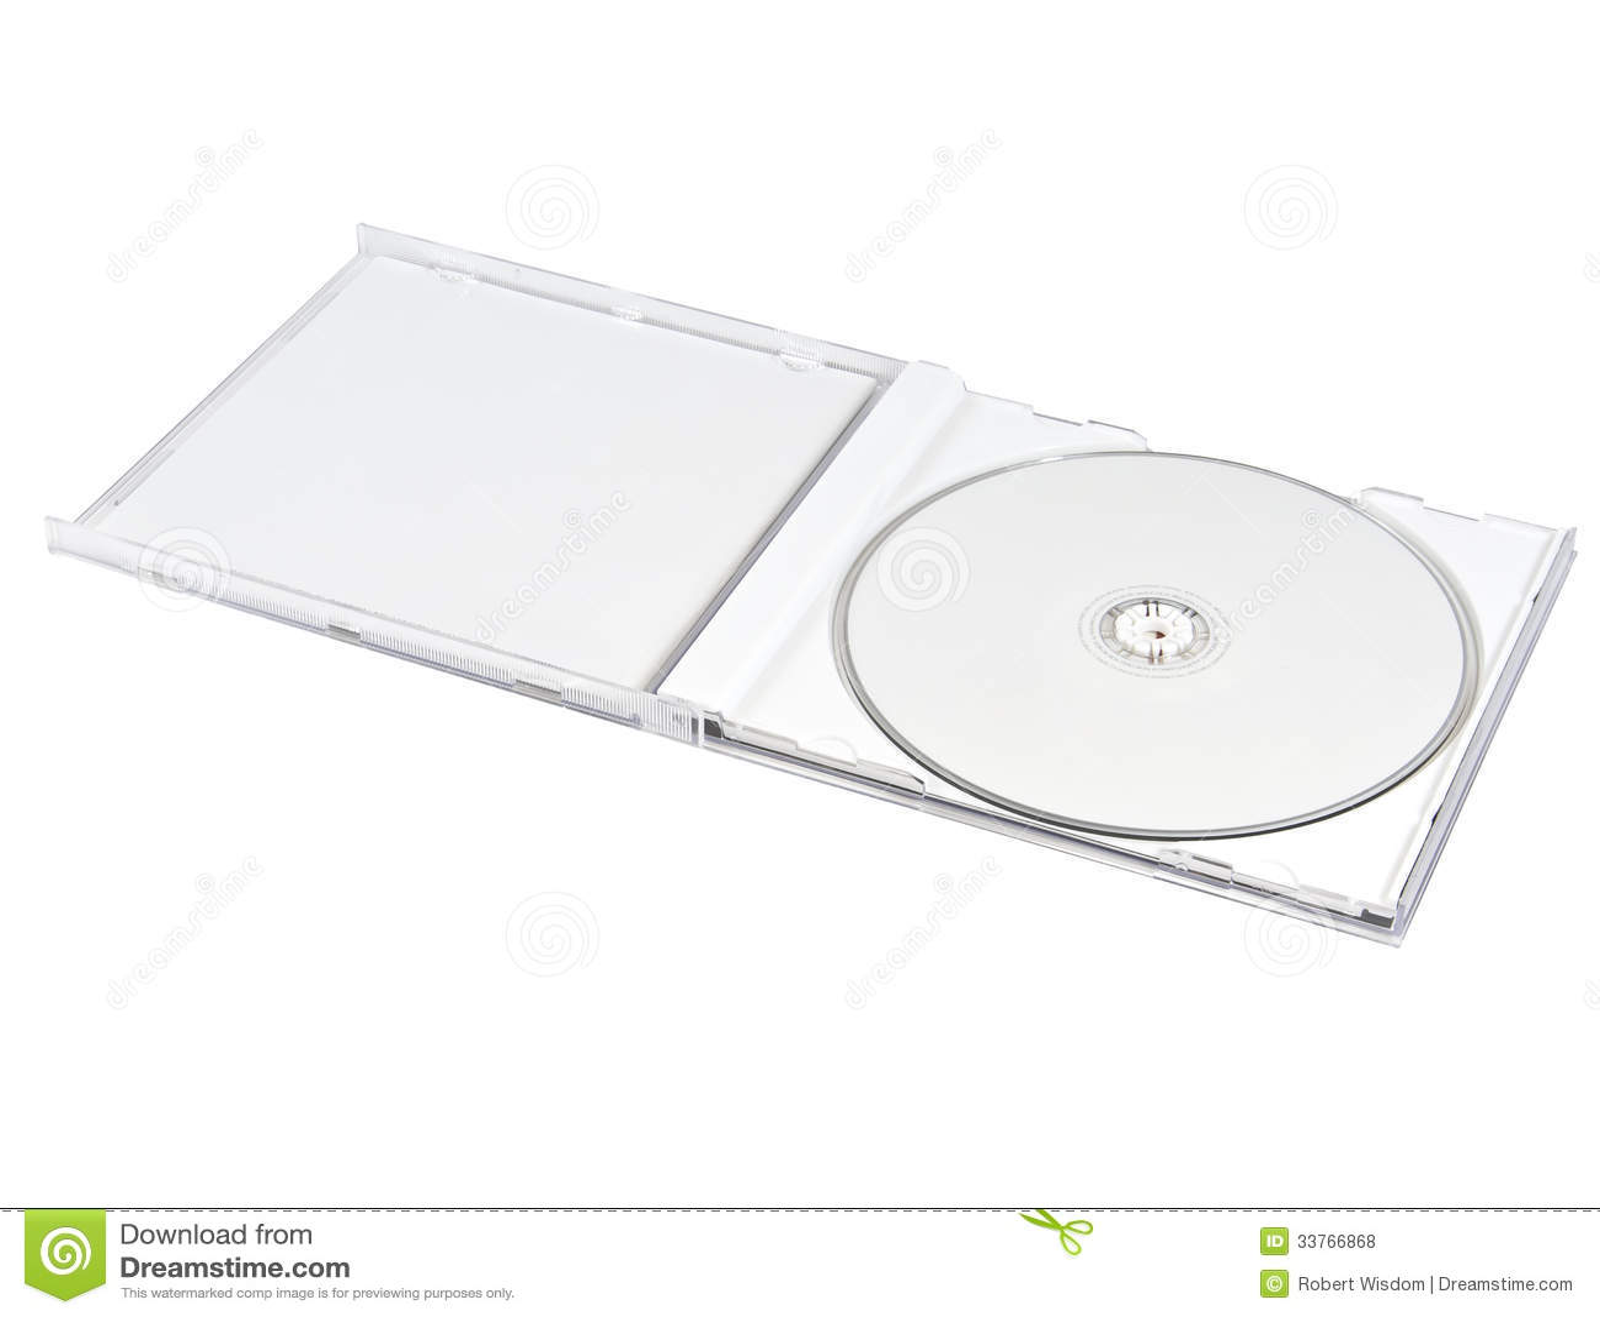 blank gold cd discs